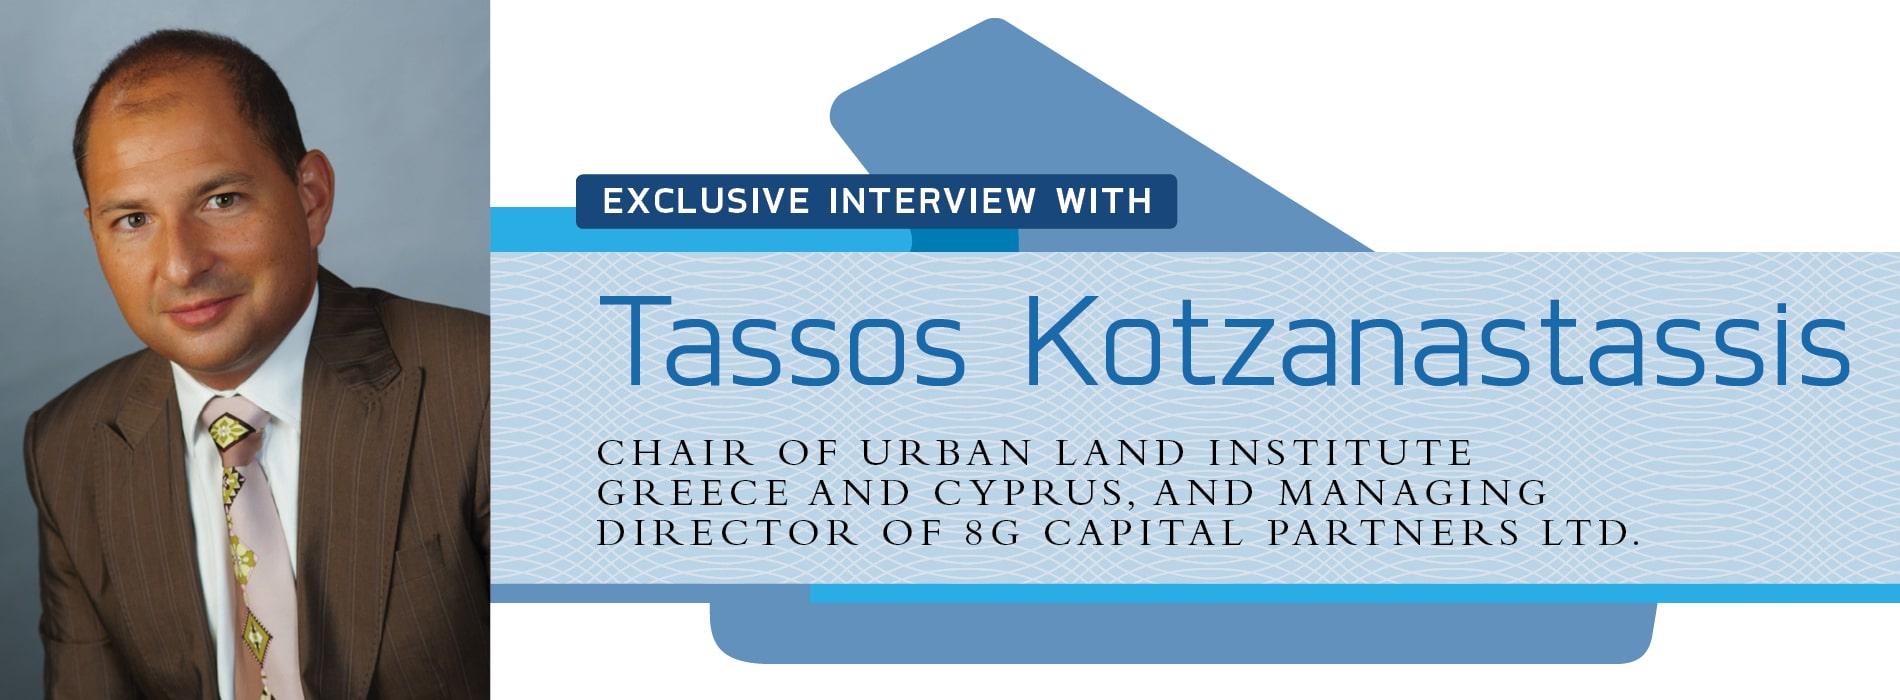 Interview with Tassos Kotzanastassis of the Urban Land Institute Greece